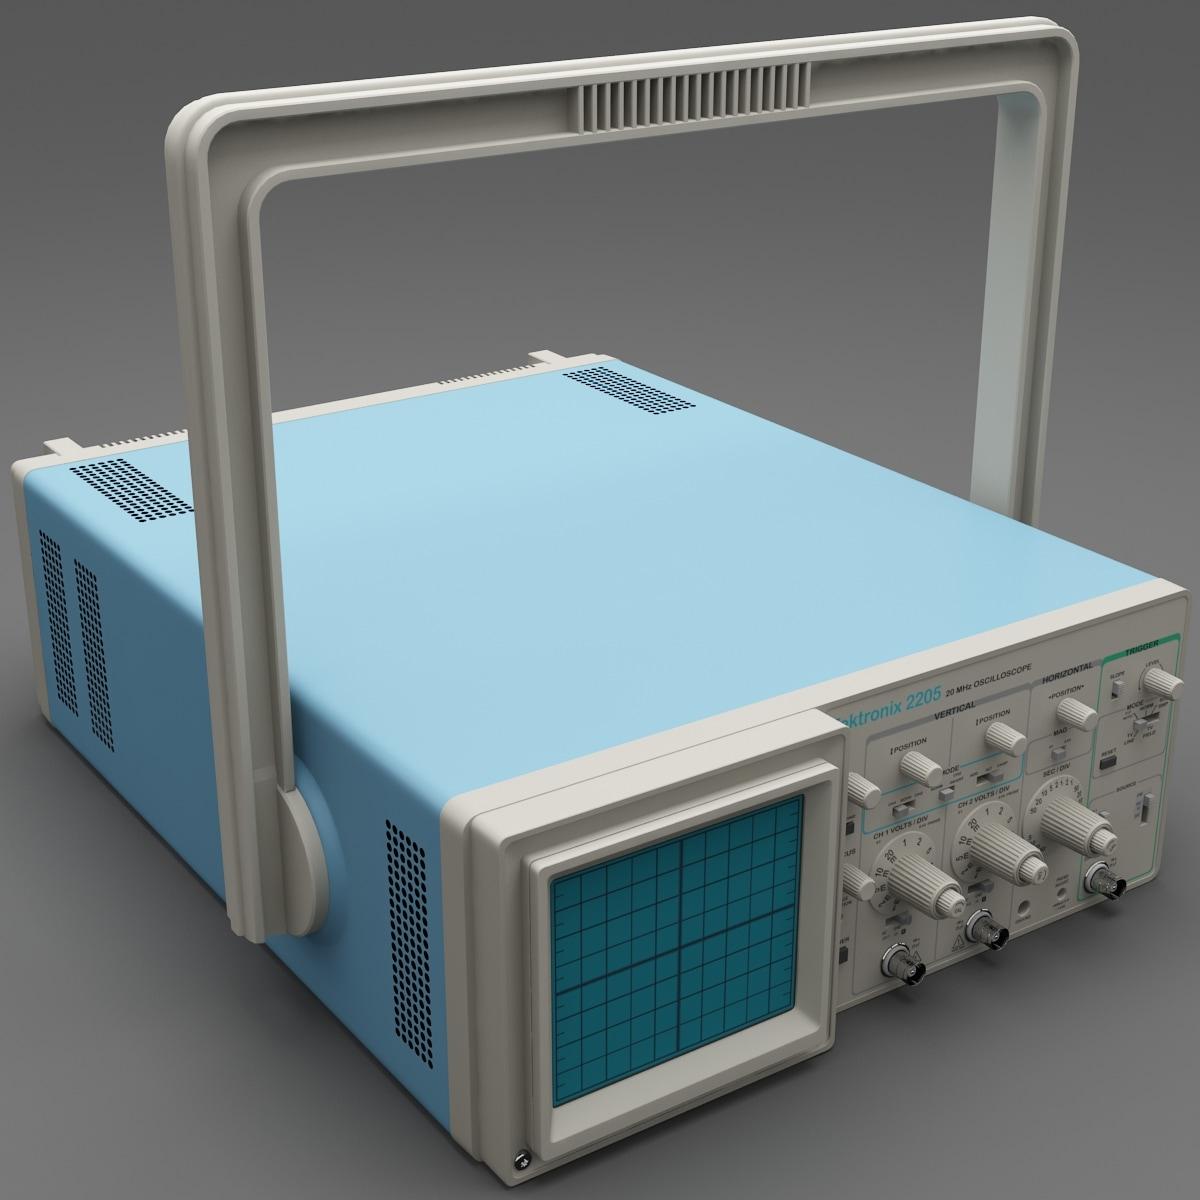 3d oscilloscope tektronix 2205